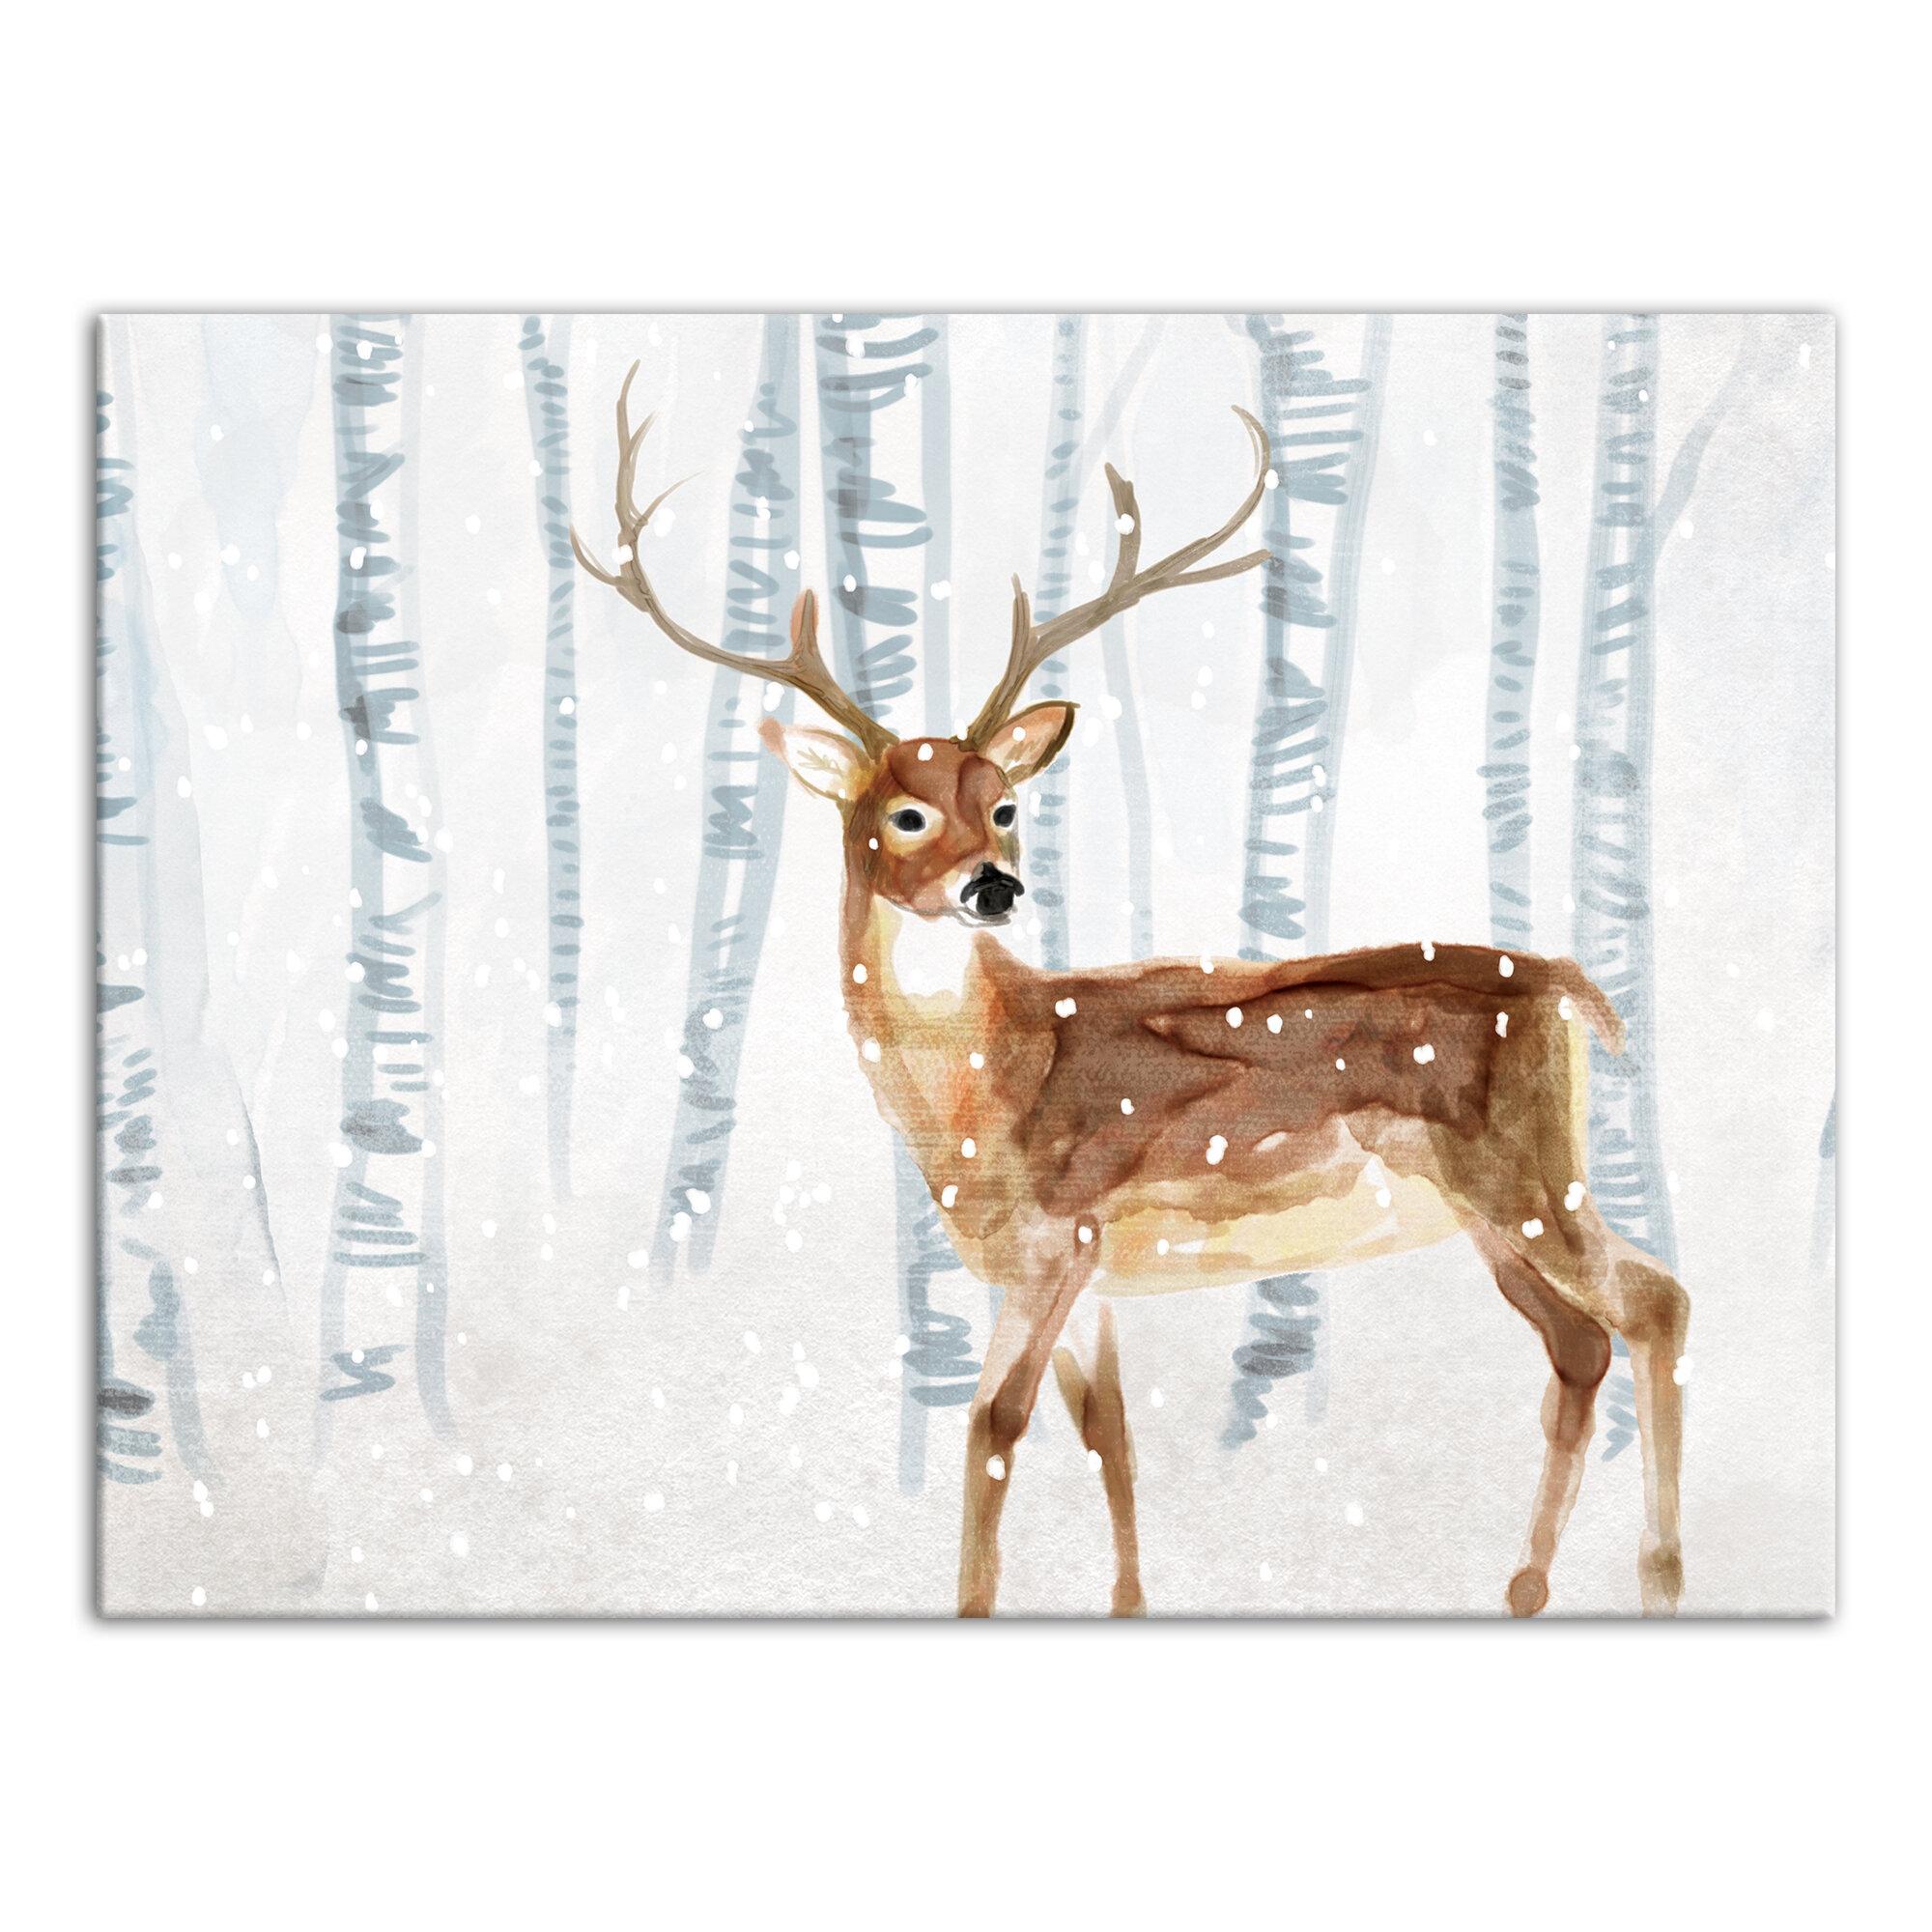 Deer In Winter Wonderland Graphic Art Print On Canvas Reviews Birch Lane